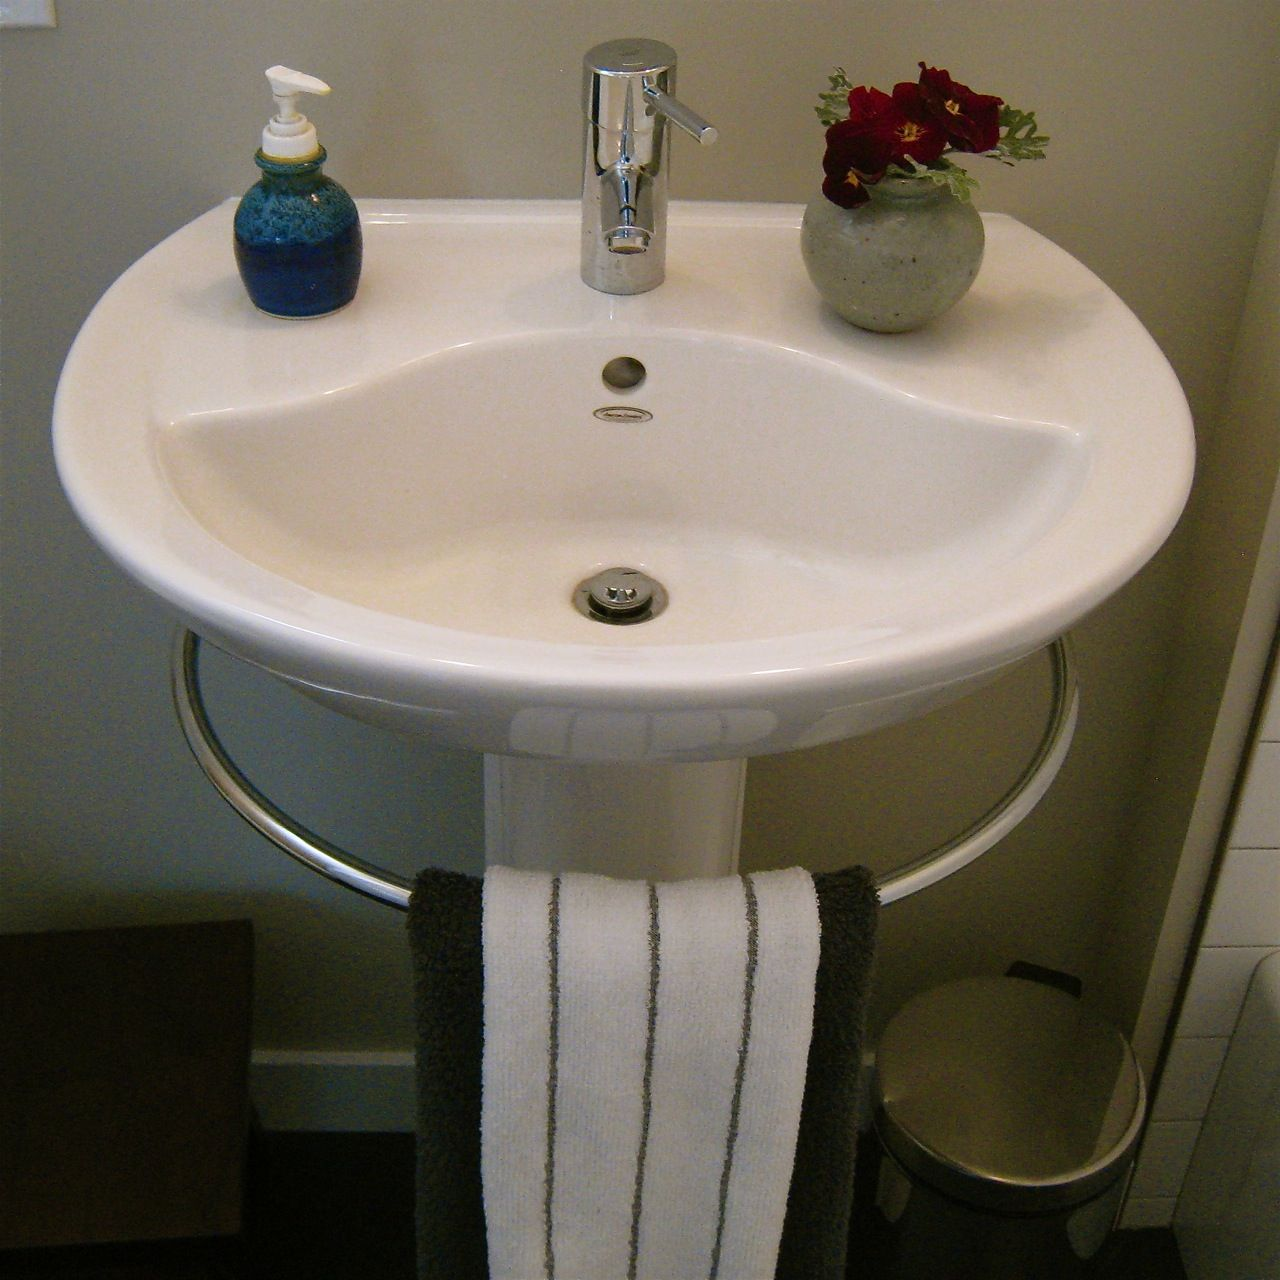 Pedestal Sink Towel Bar Genius